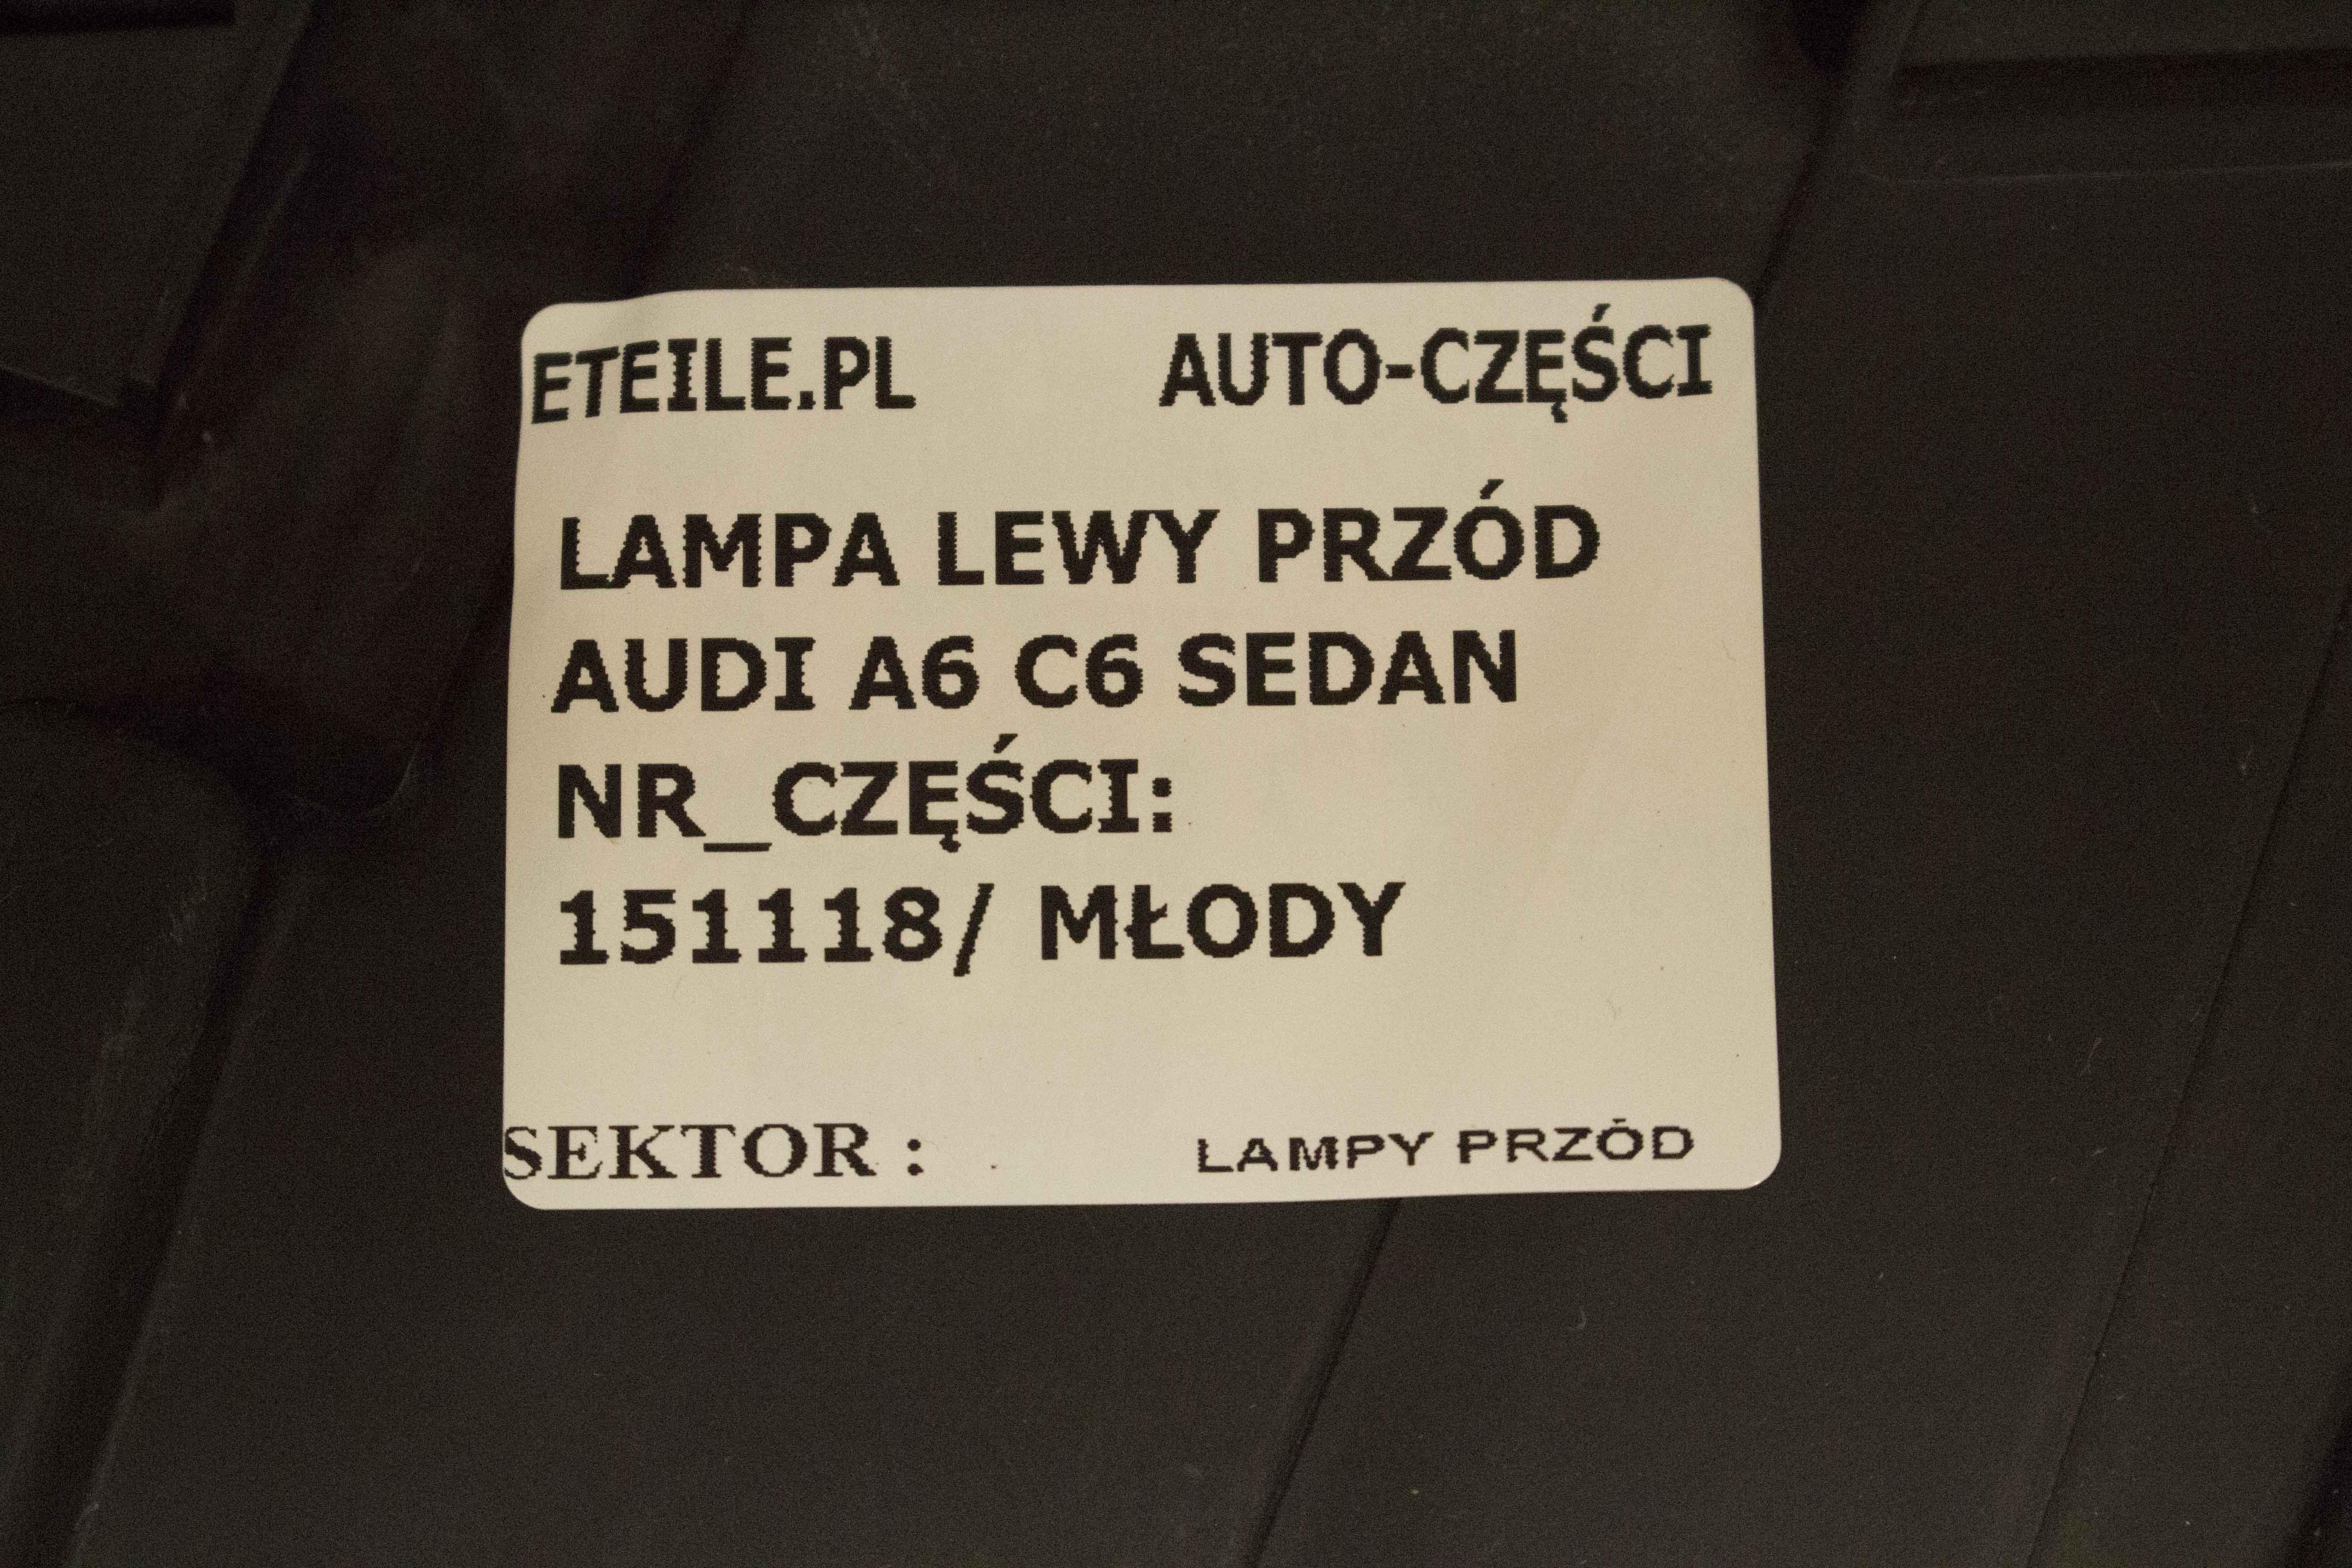 Eteile Sklep Lewy A6 pl C6 Przednia 4f0 Lampa Lewa Audi Przód tChQordBsx